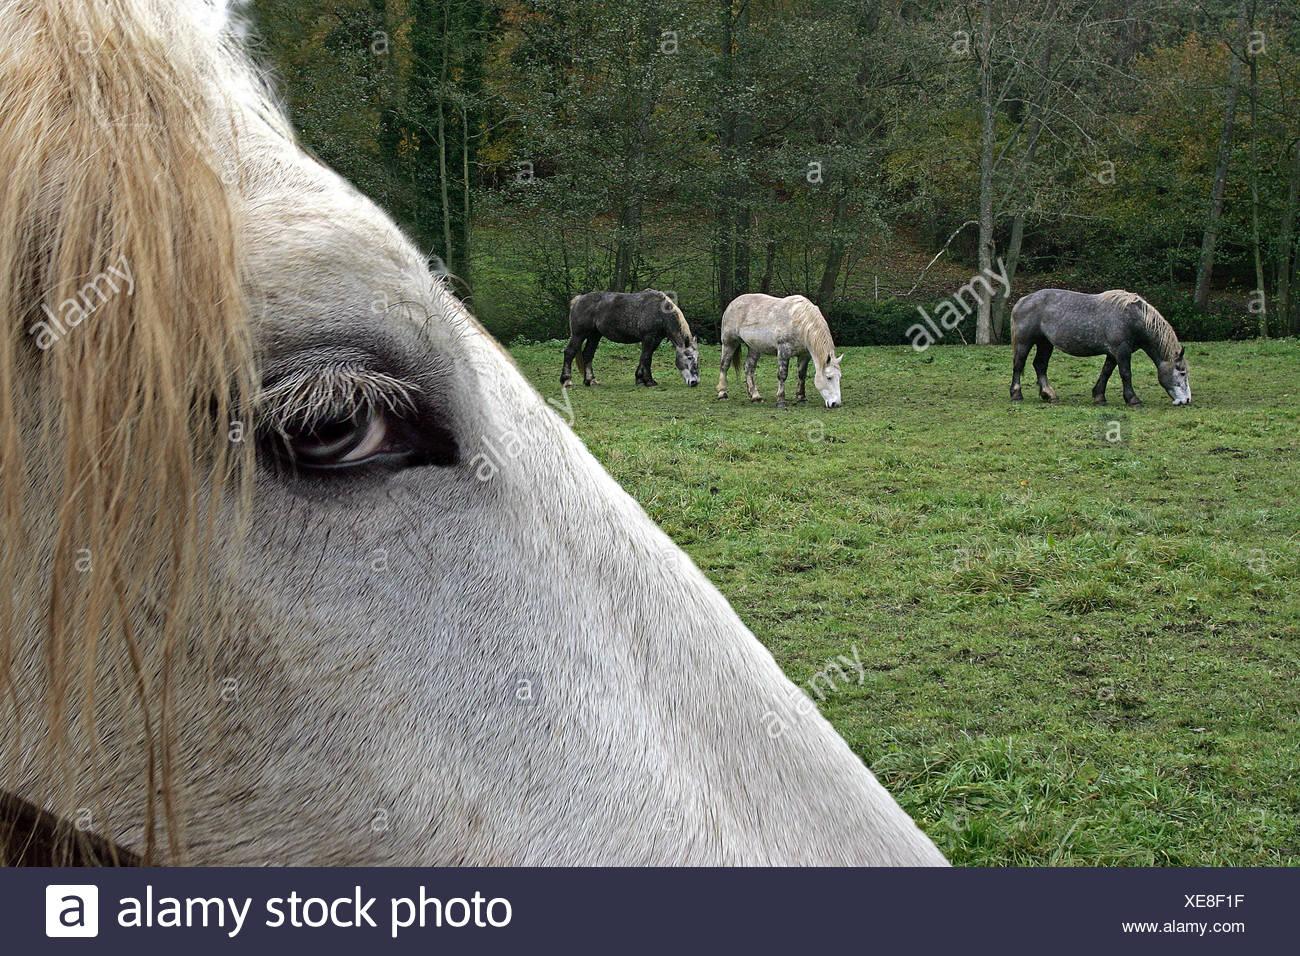 Percheron Draft Horses, a French Breed, Close up of Eye - Stock Image